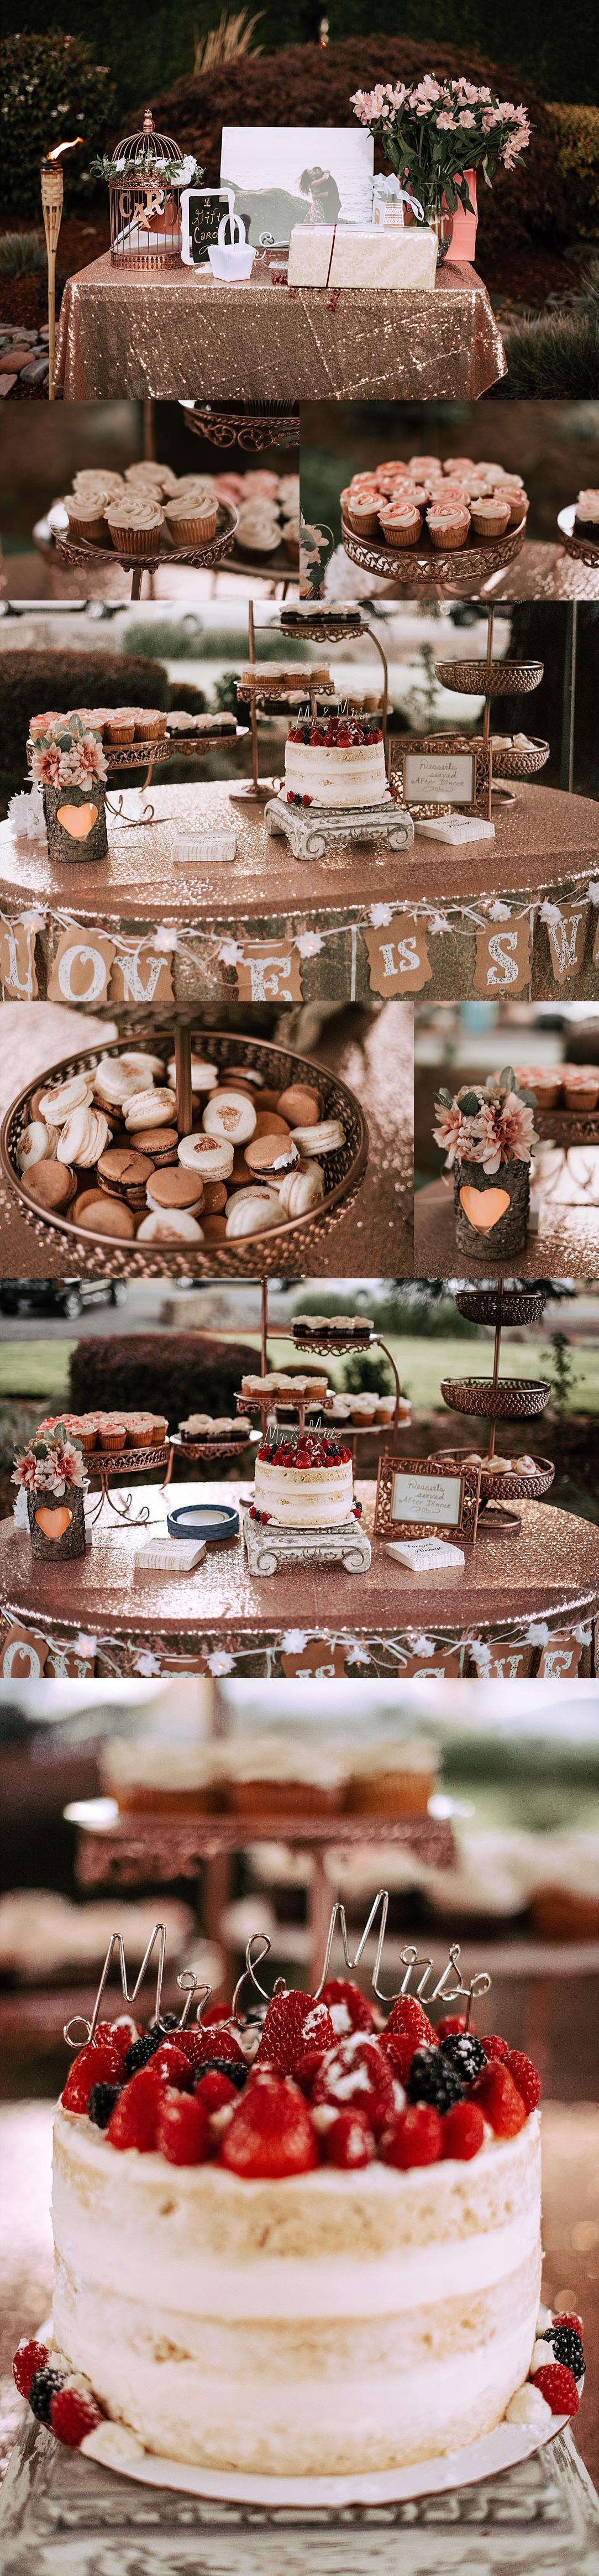 romantic backyard wedding_0006.jpg